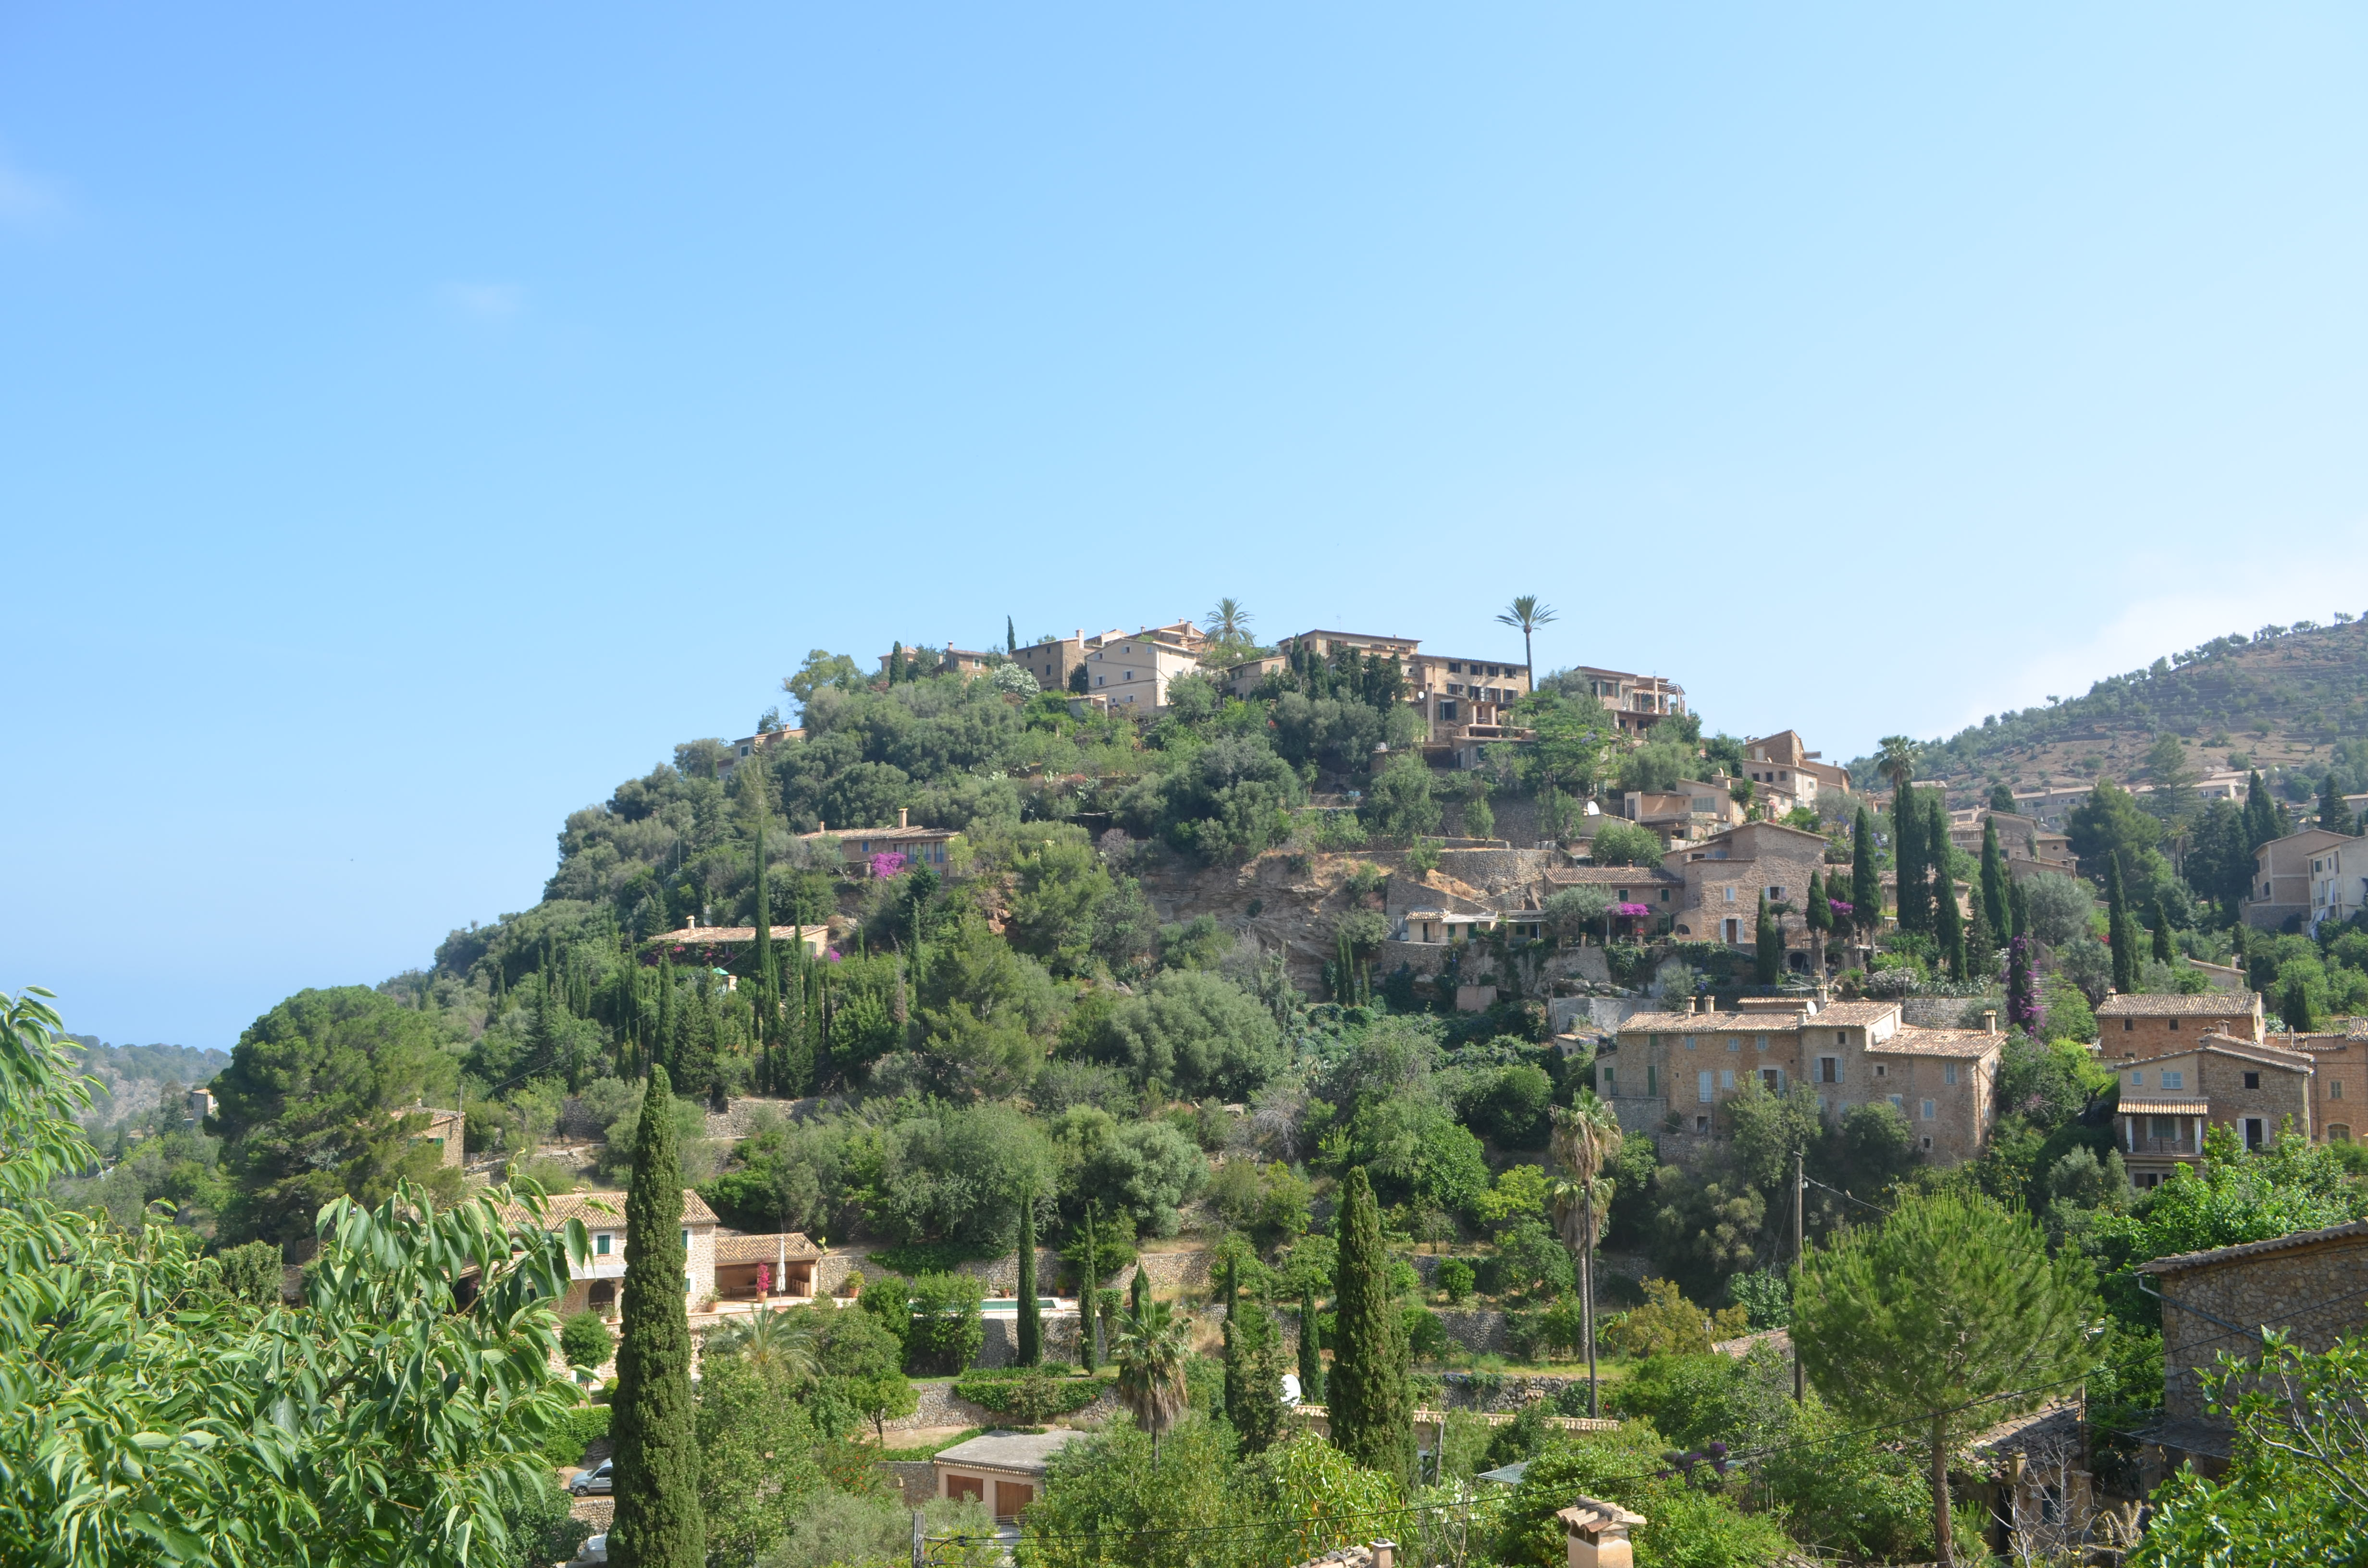 Mallorca Fincaurlaub und Roadtrip durch die Serra de Tramuntana